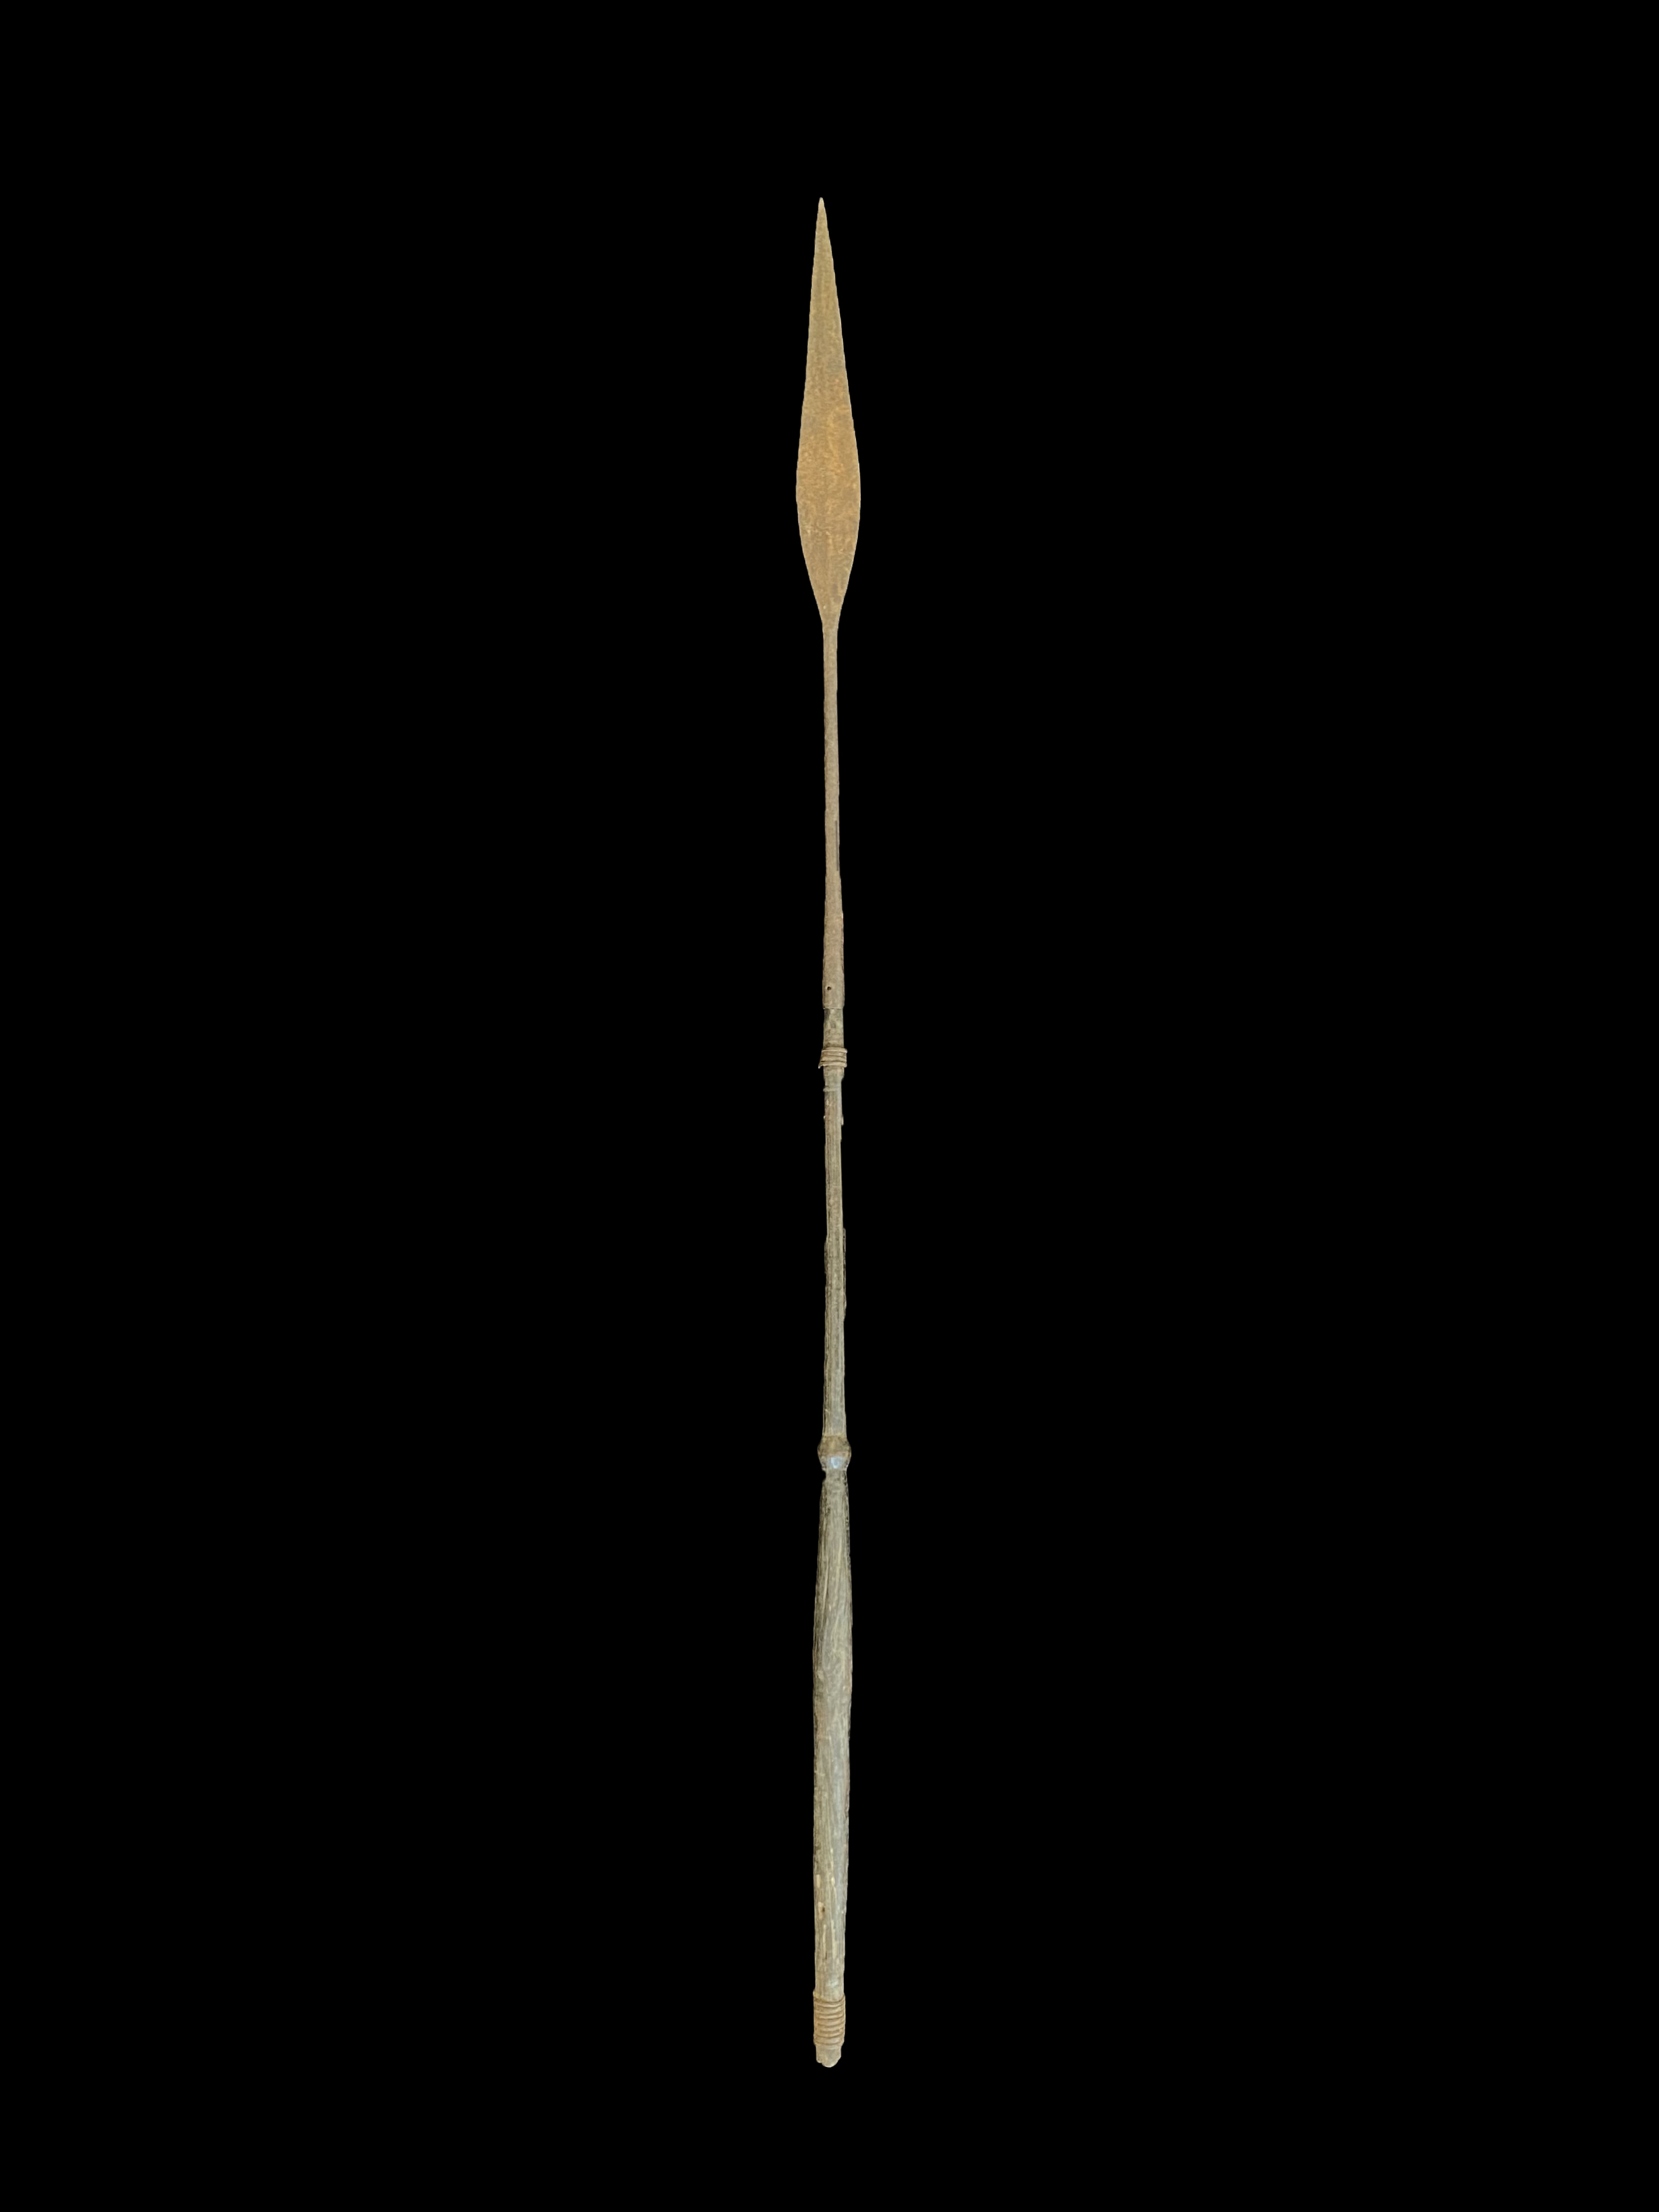 Ceremonial Spear - Kuba People, D.R. Congo (c)